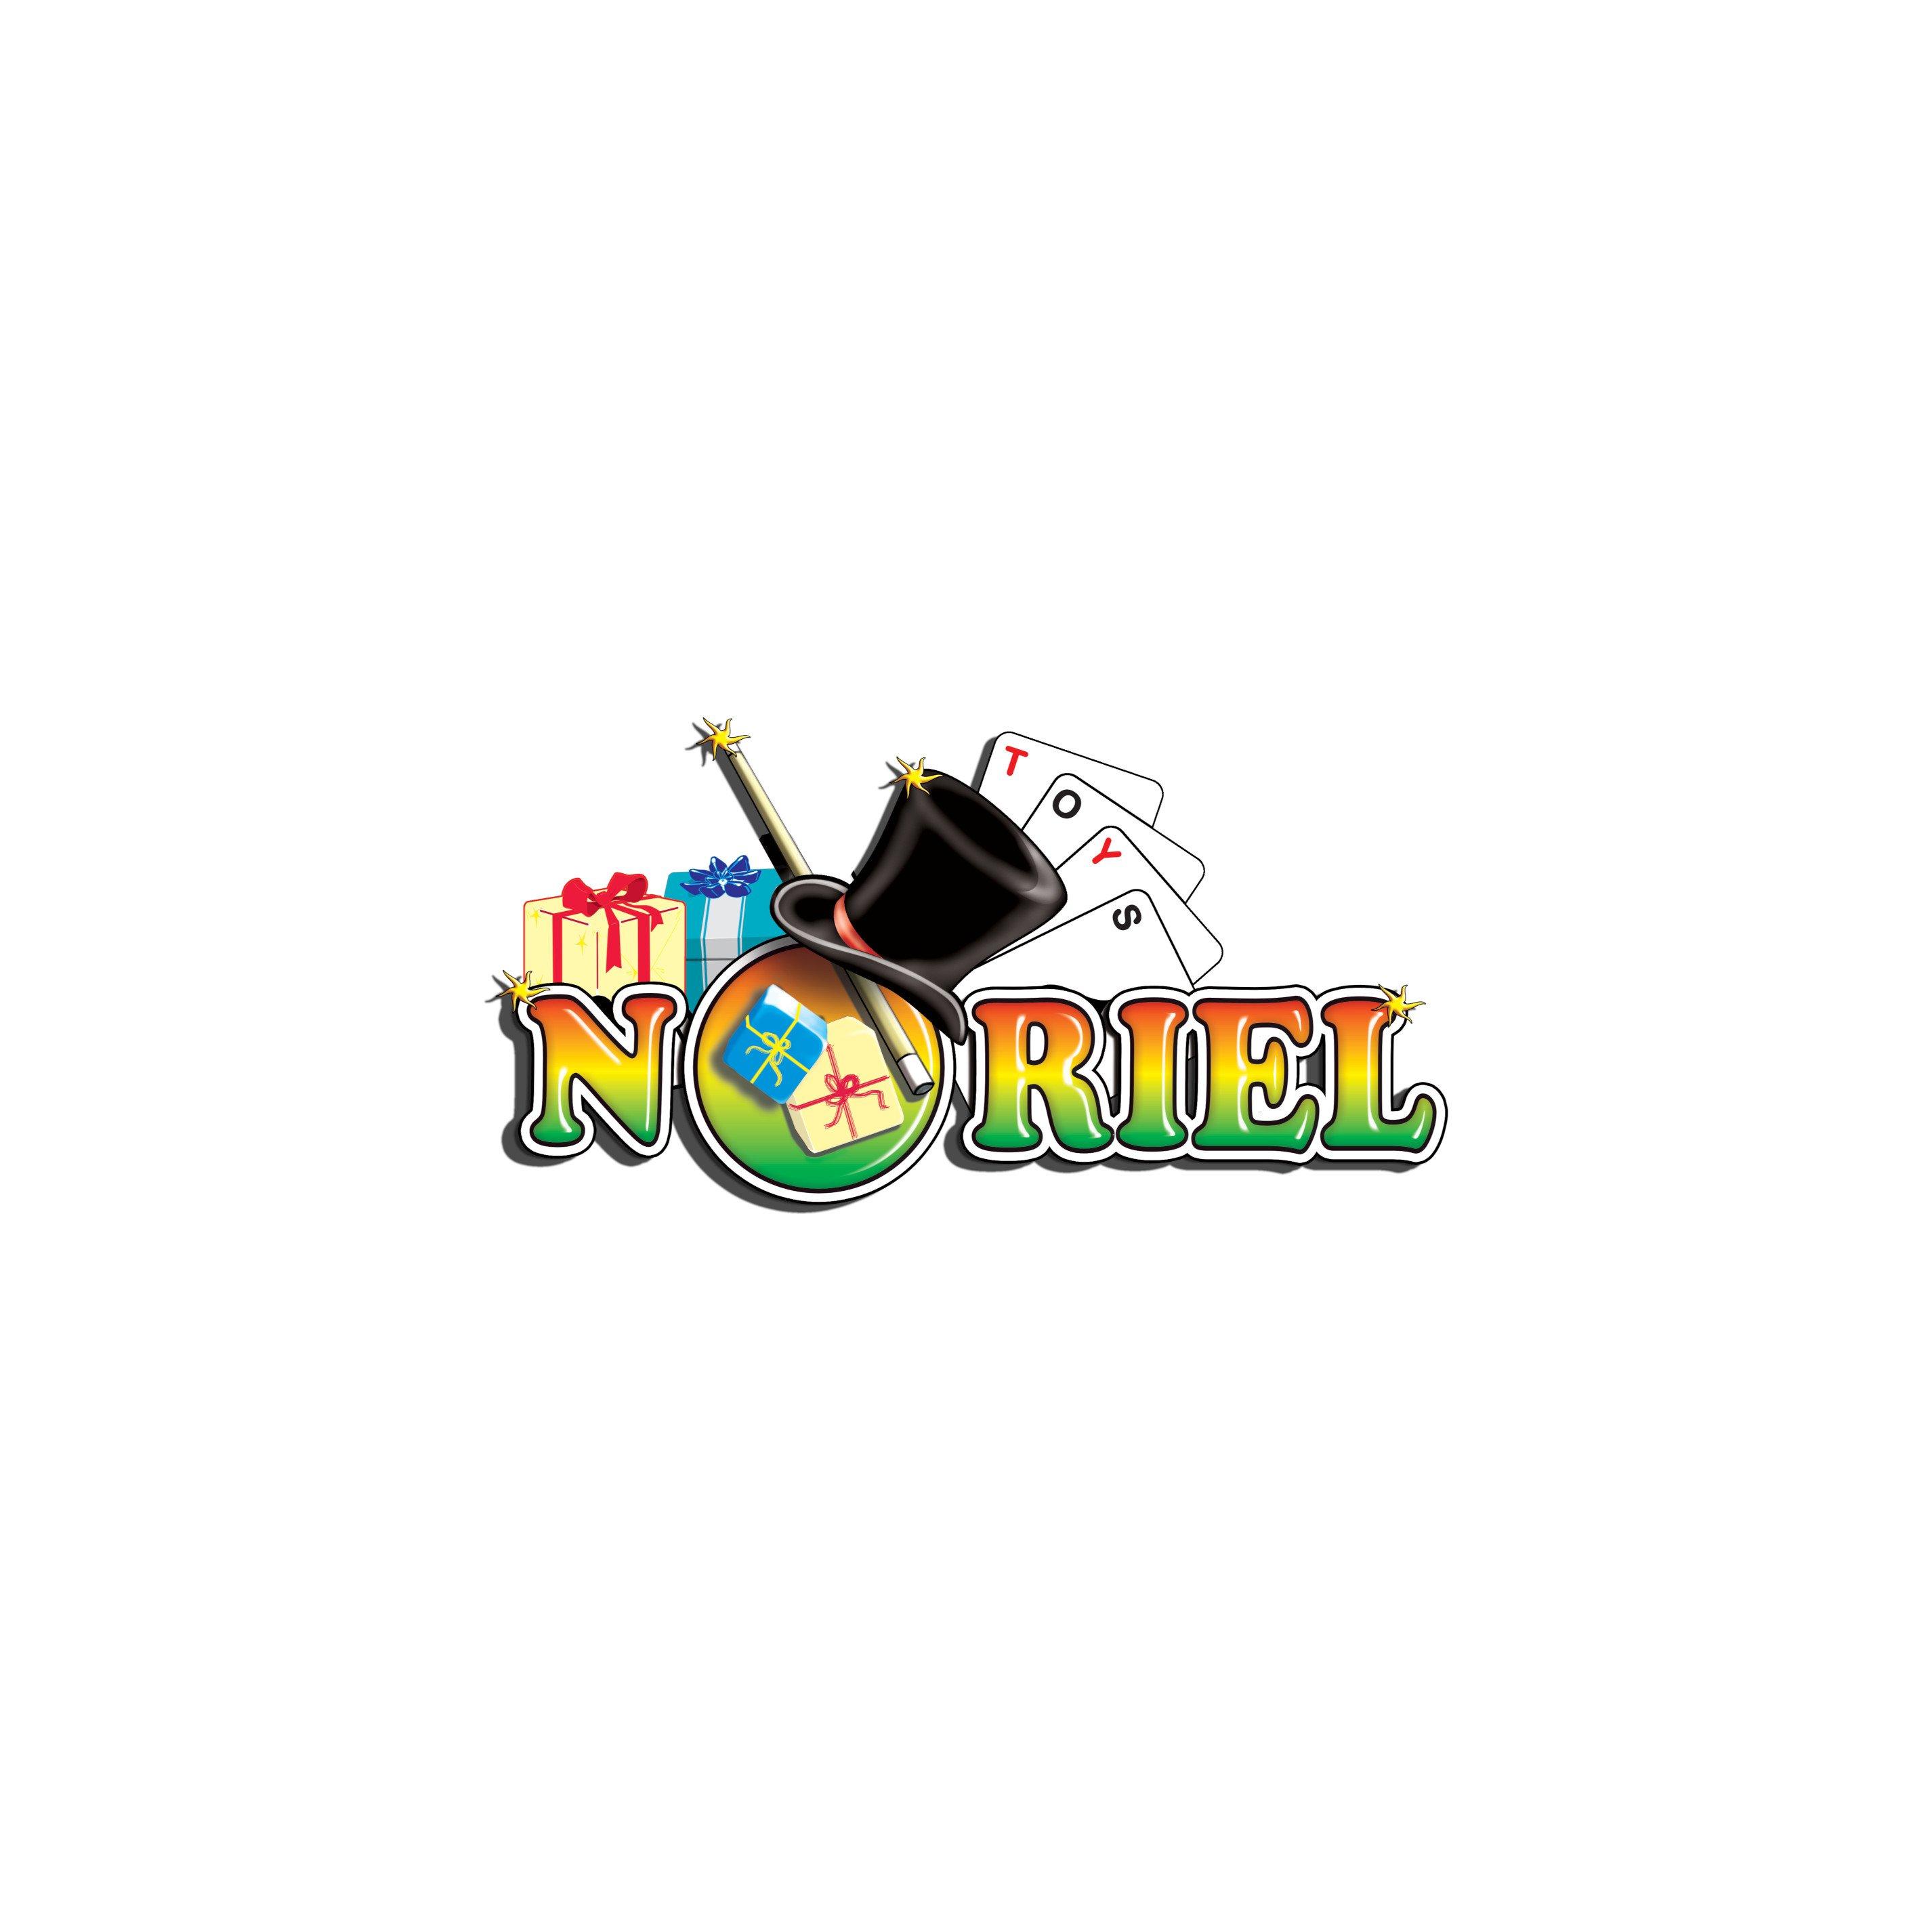 22331231 Tricou cu desen unicorn Minoti Funhouse